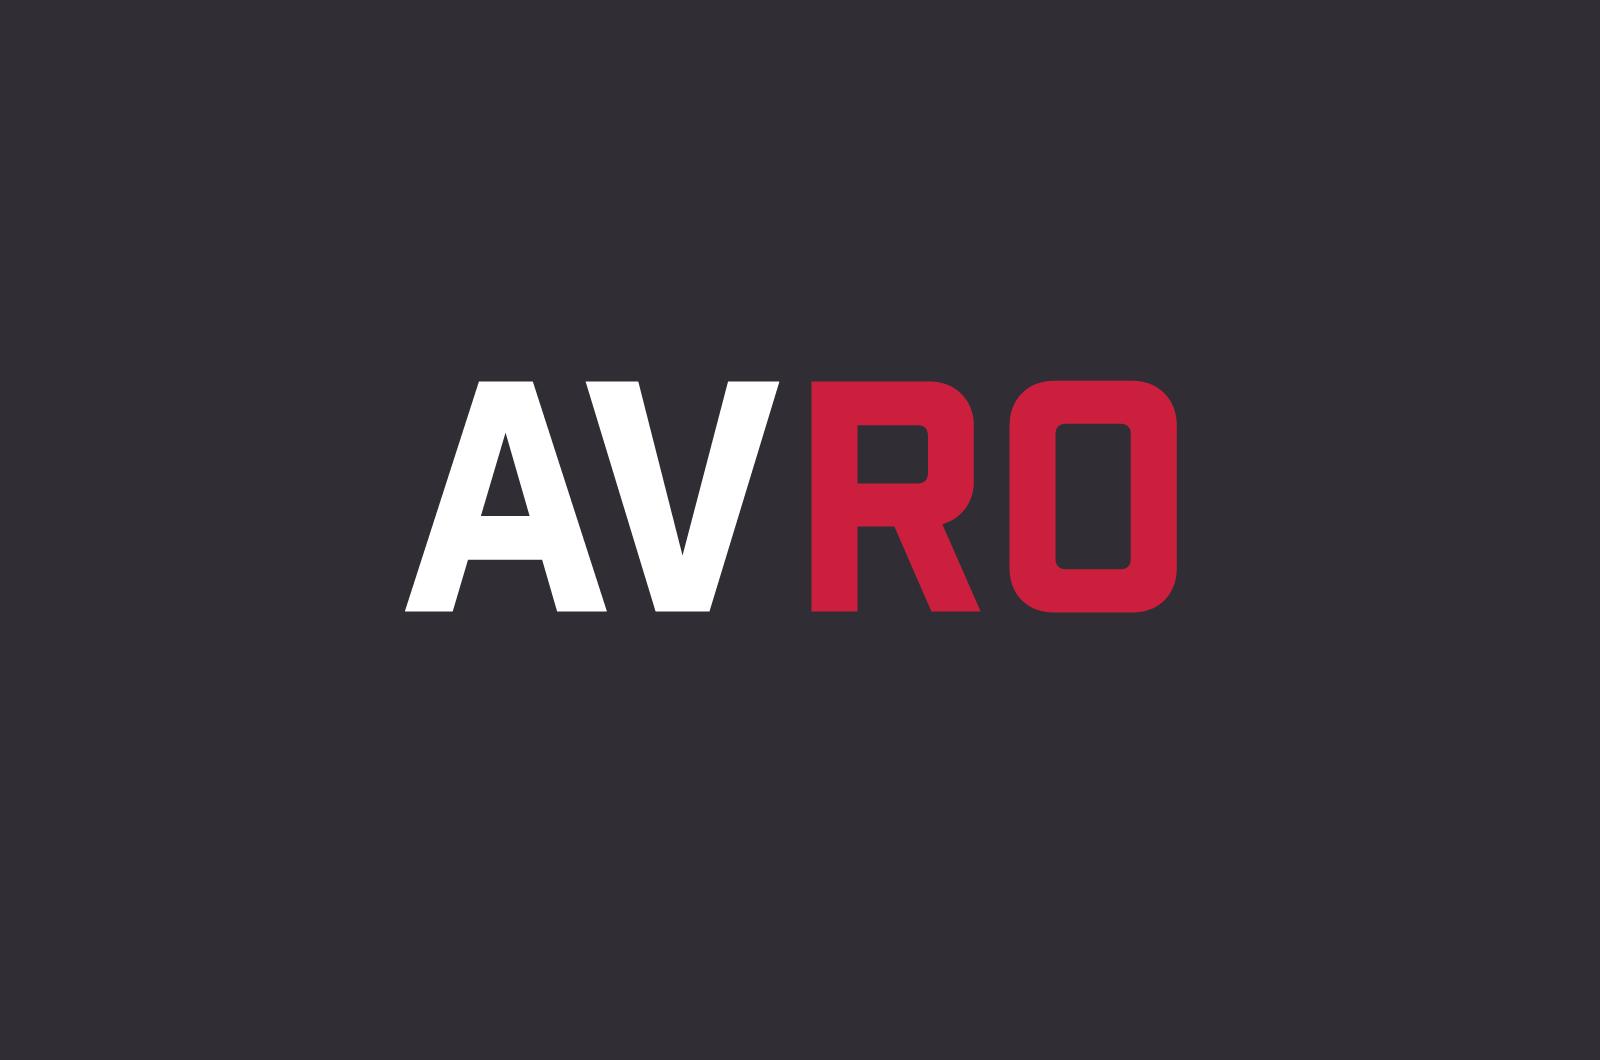 AVRO Brand 03